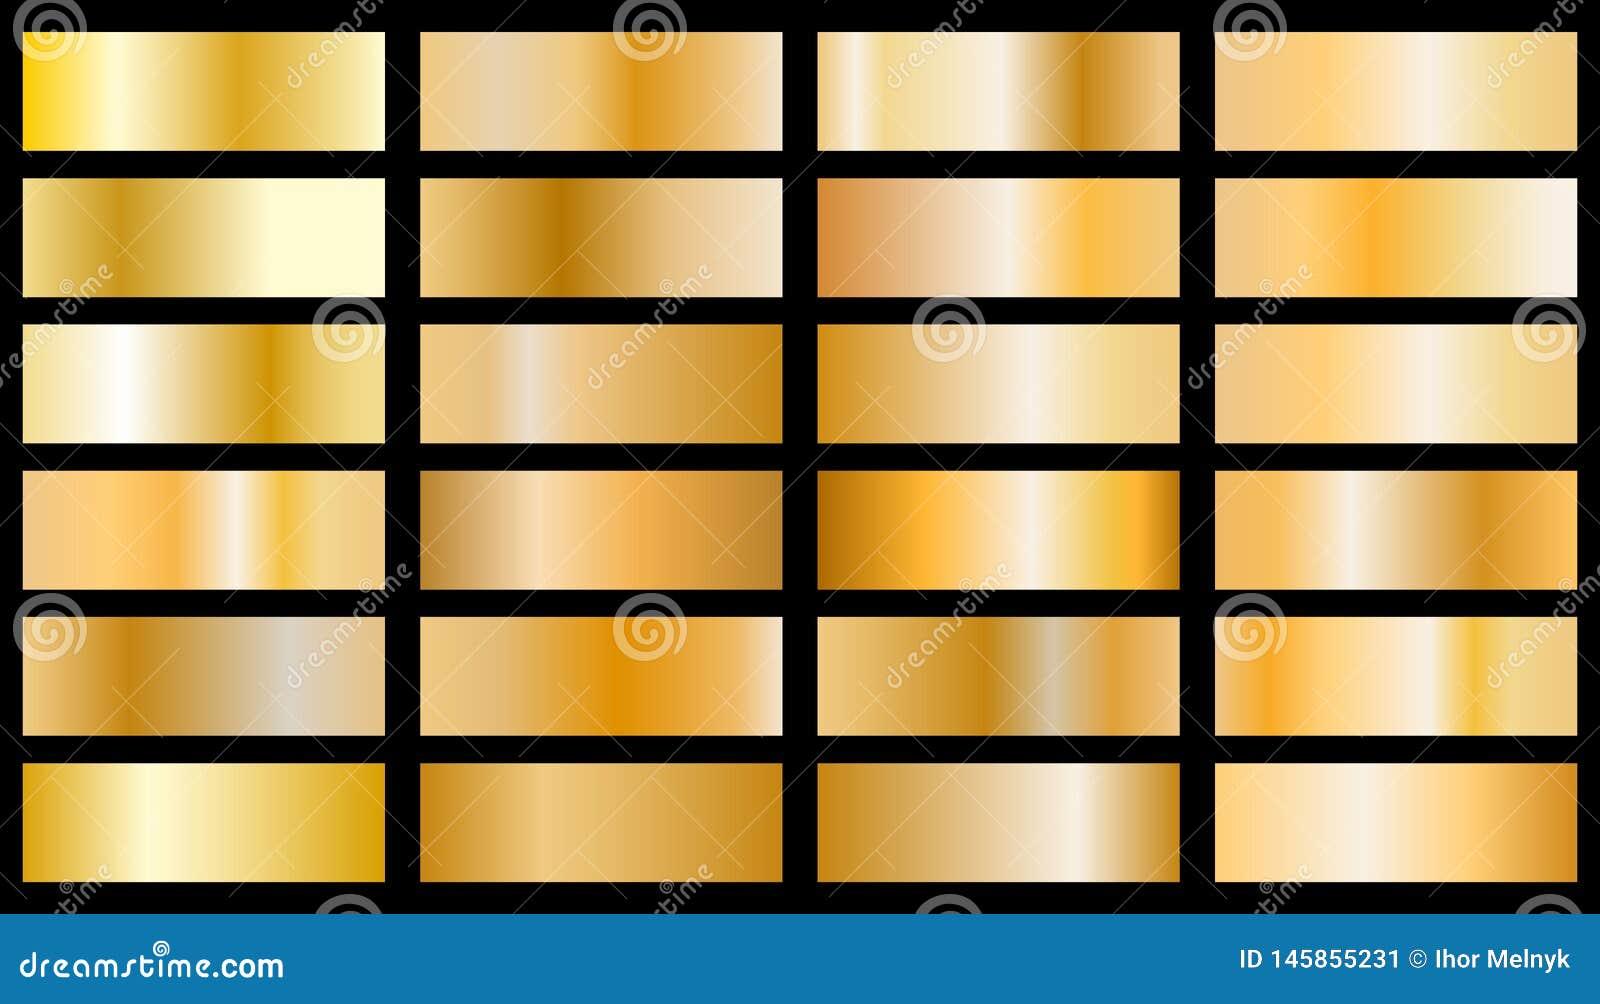 Vetor da textura do fundo do ouro